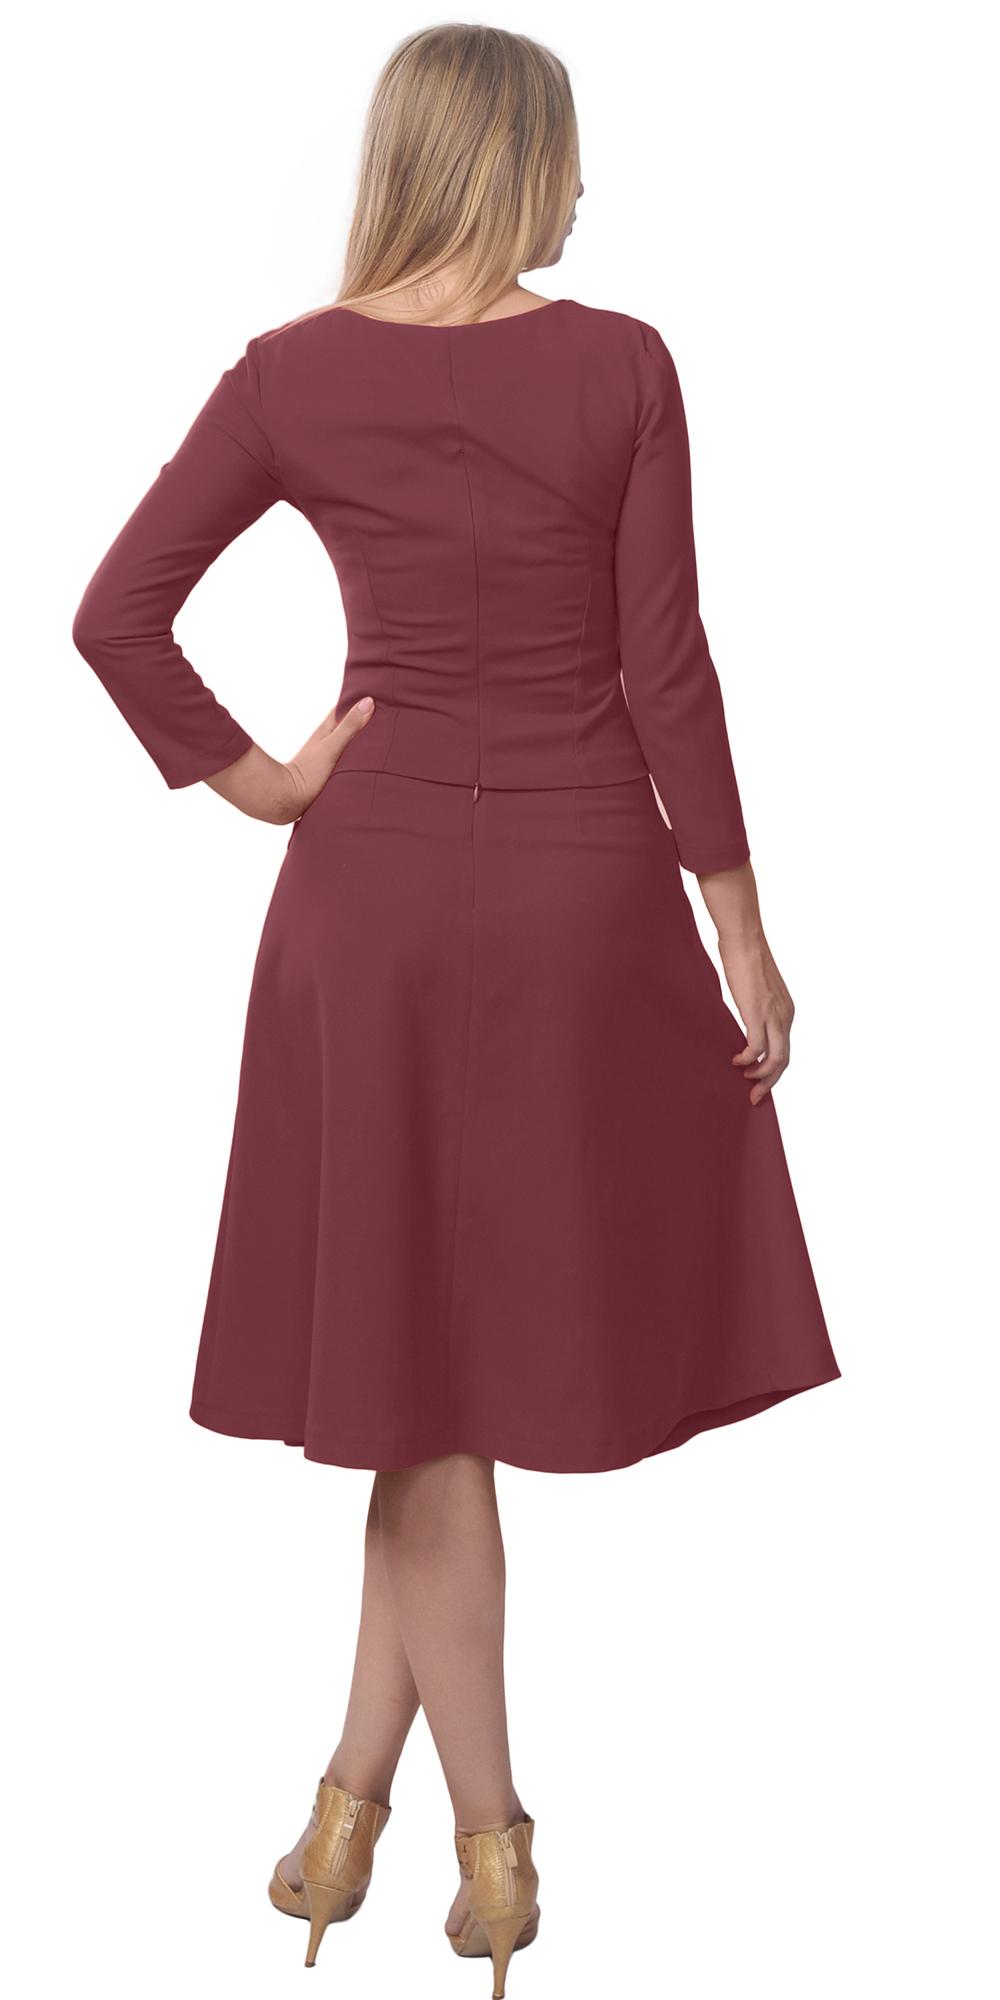 CLASSIC CLASSY BUSINESS CHURCH WORK VINTAGE ALINE MIDI SKIRT SUIT DRESS A6105   eBay